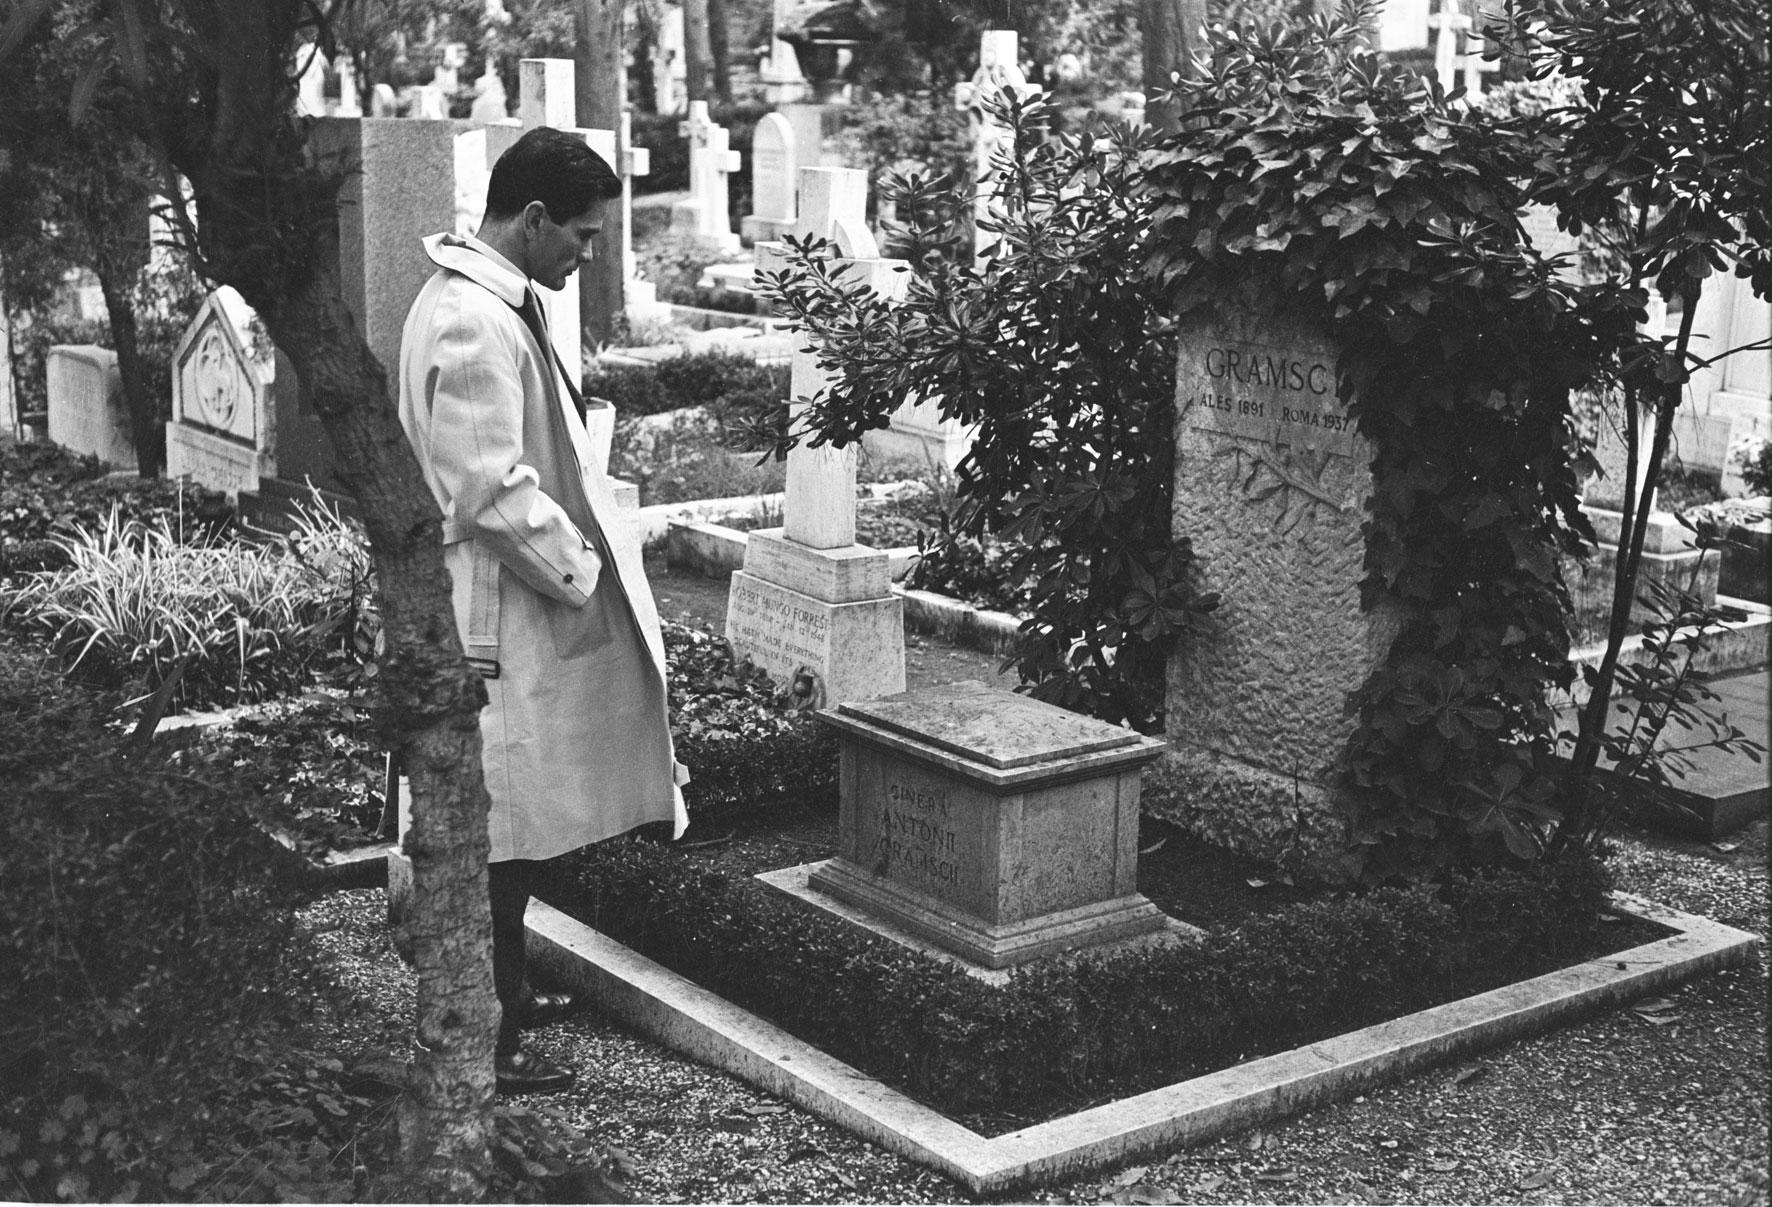 https://fr.m.wikipedia.org/wiki/Fichier:Gramsci_Pasolini.jpg